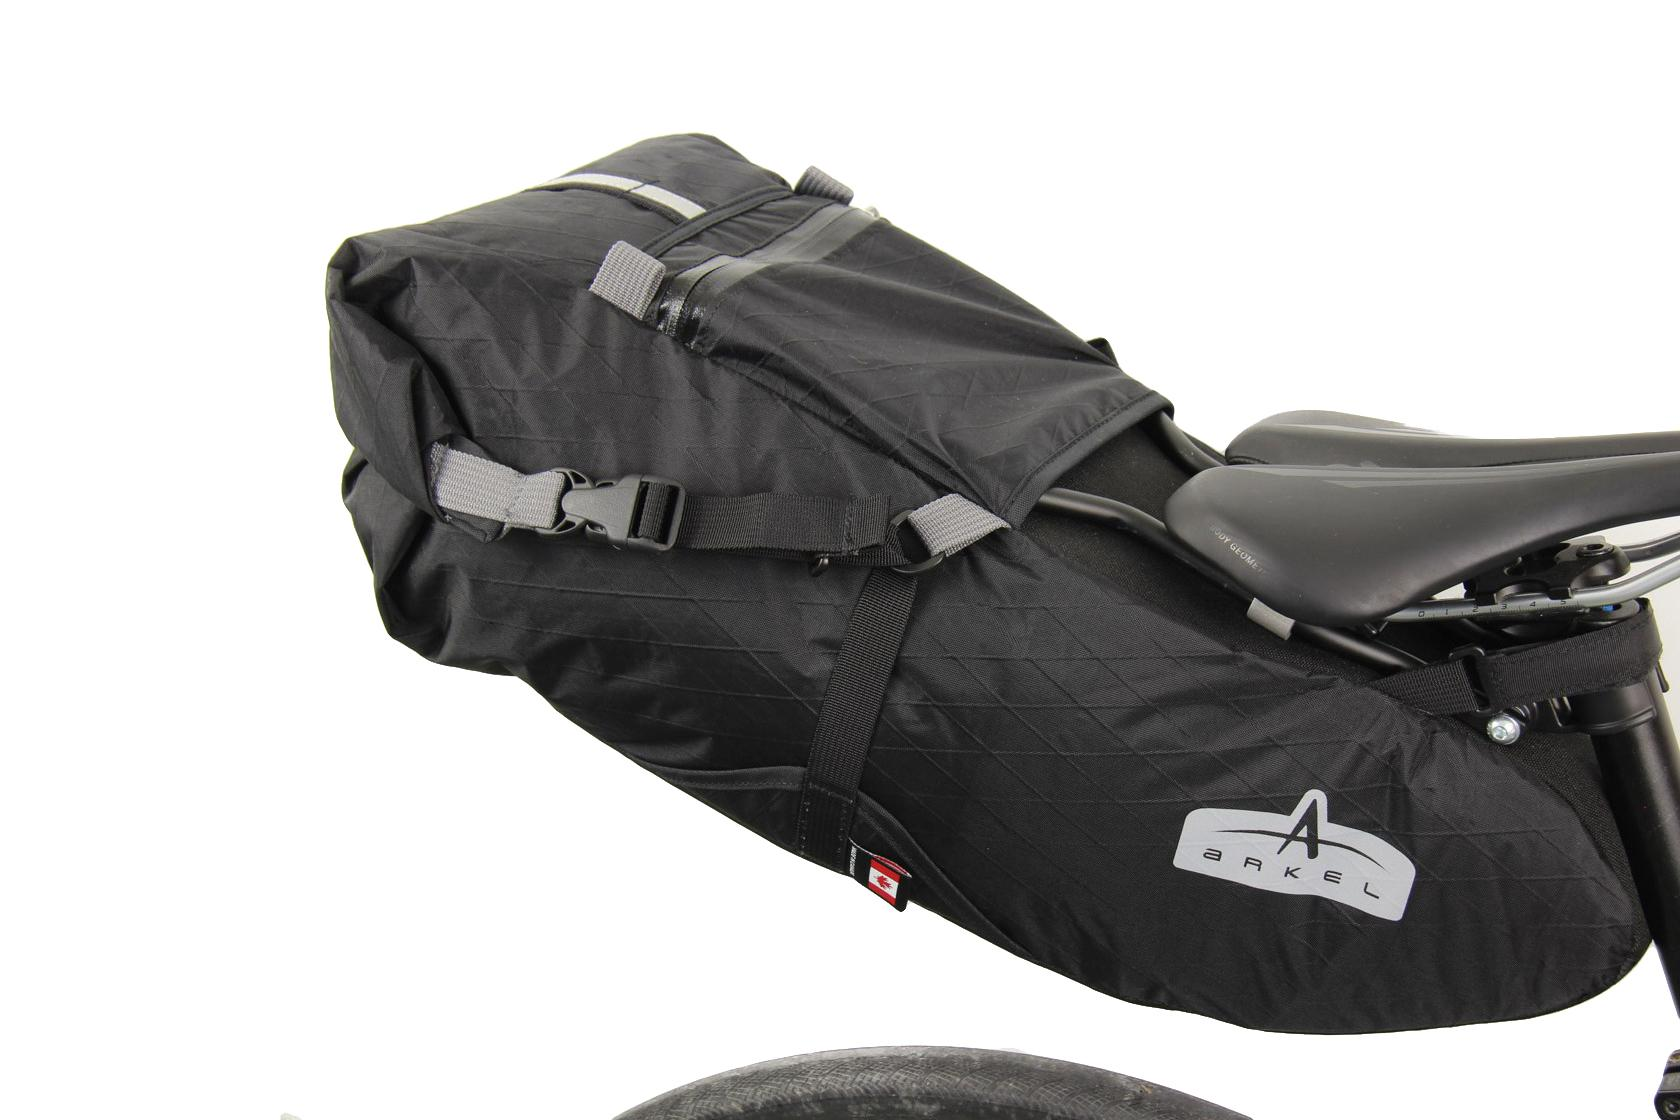 seatpacker-15-bikepacking-seat-bag-3